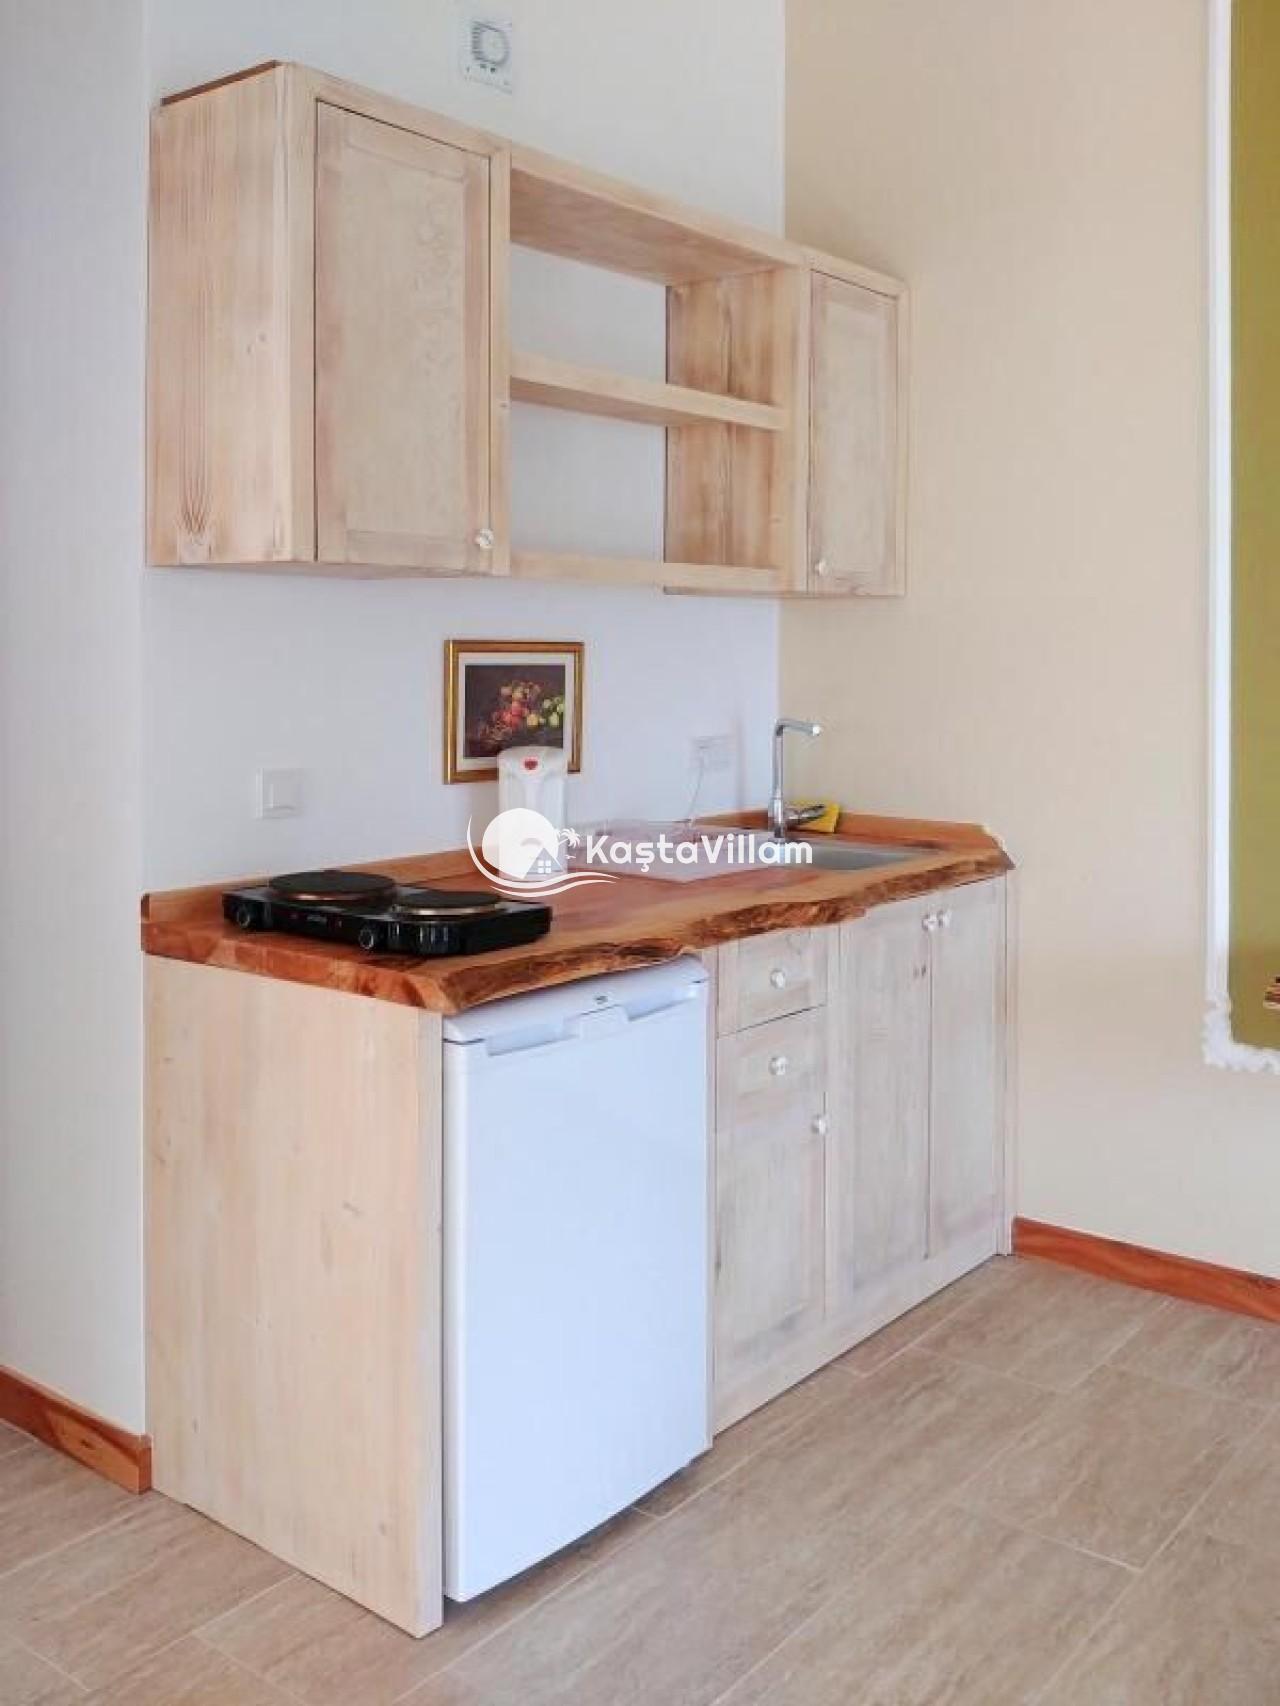 VİLLEAPARTS 1   Kaş Kiralık Villa, Kaş Yazlık Villa - Kaştavillam